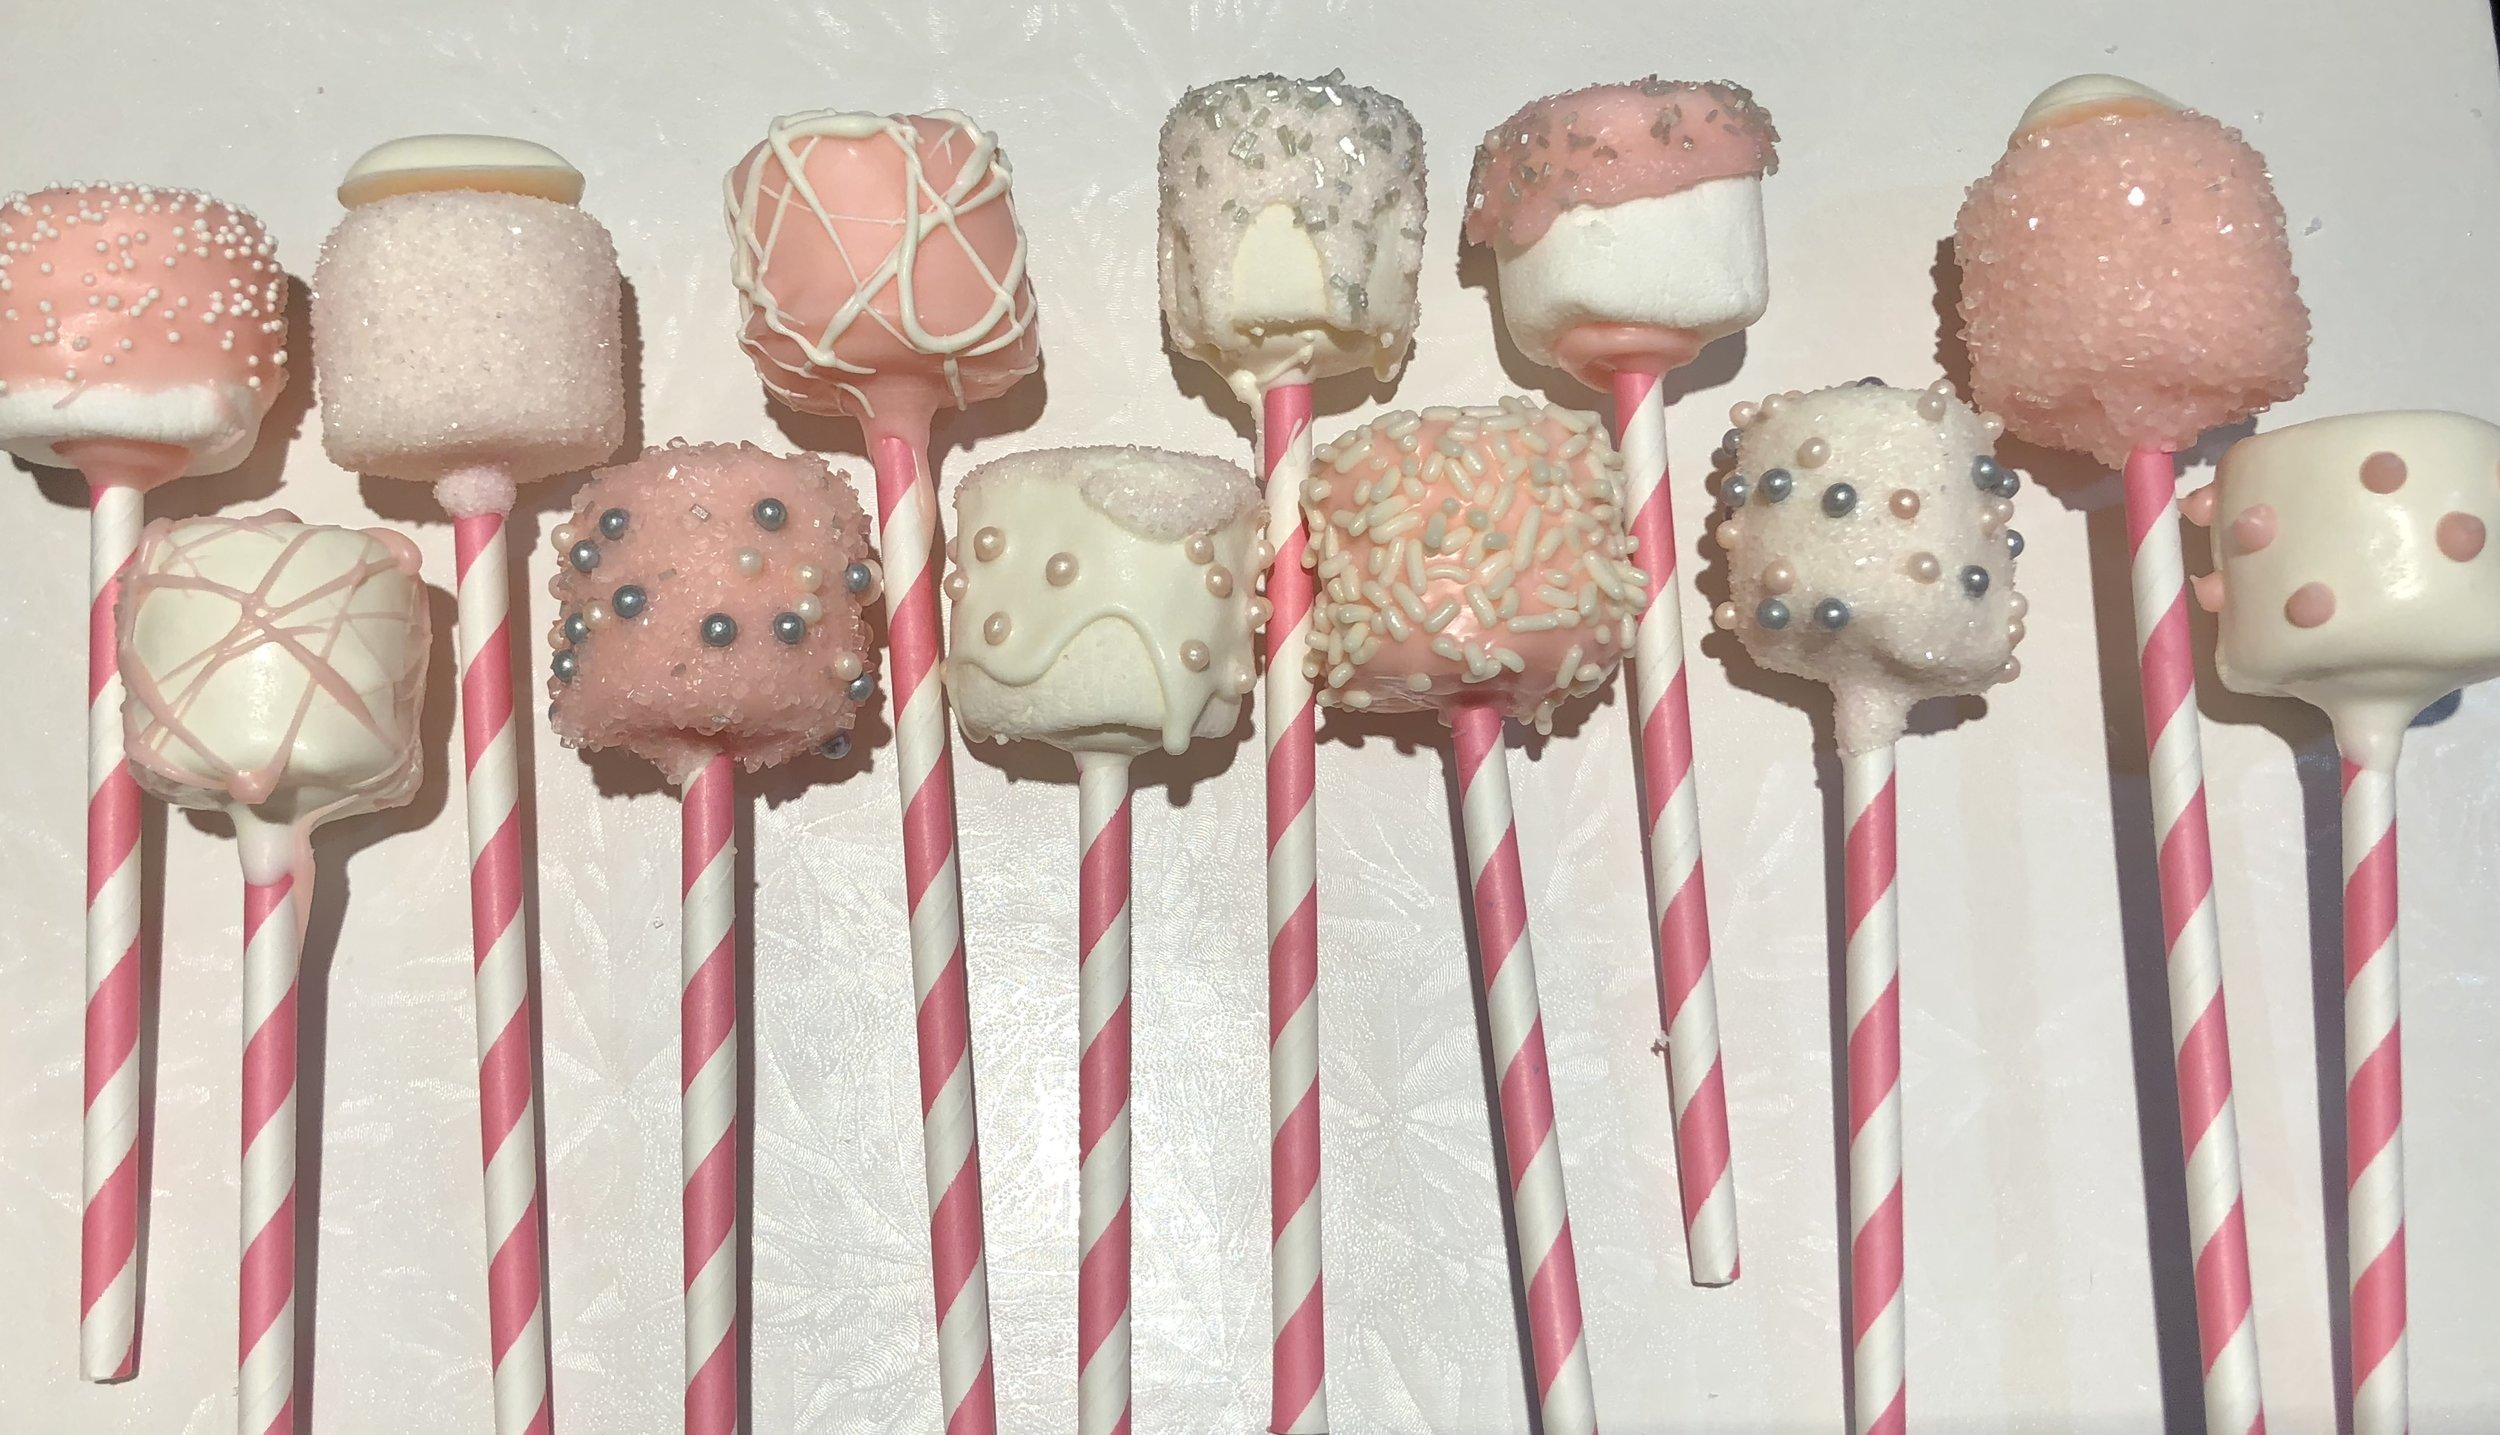 Pink Variety Marshmallow Pops